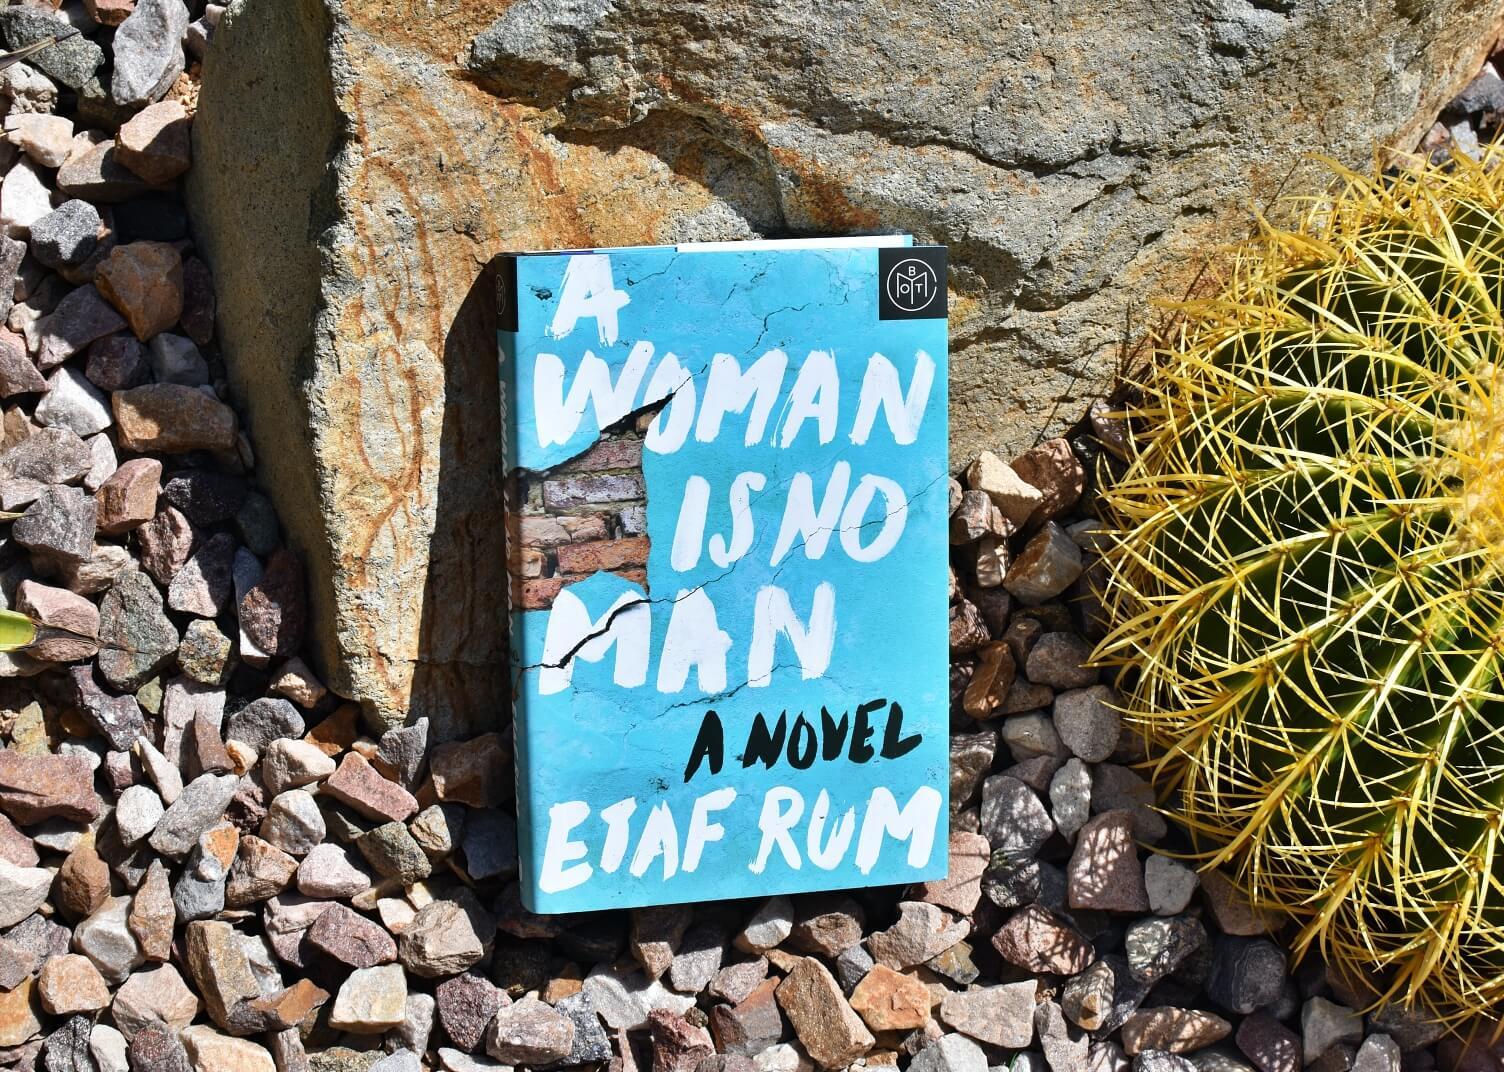 A Woman is No Man Etaf Rum Book Club Questions - Book Club Chat